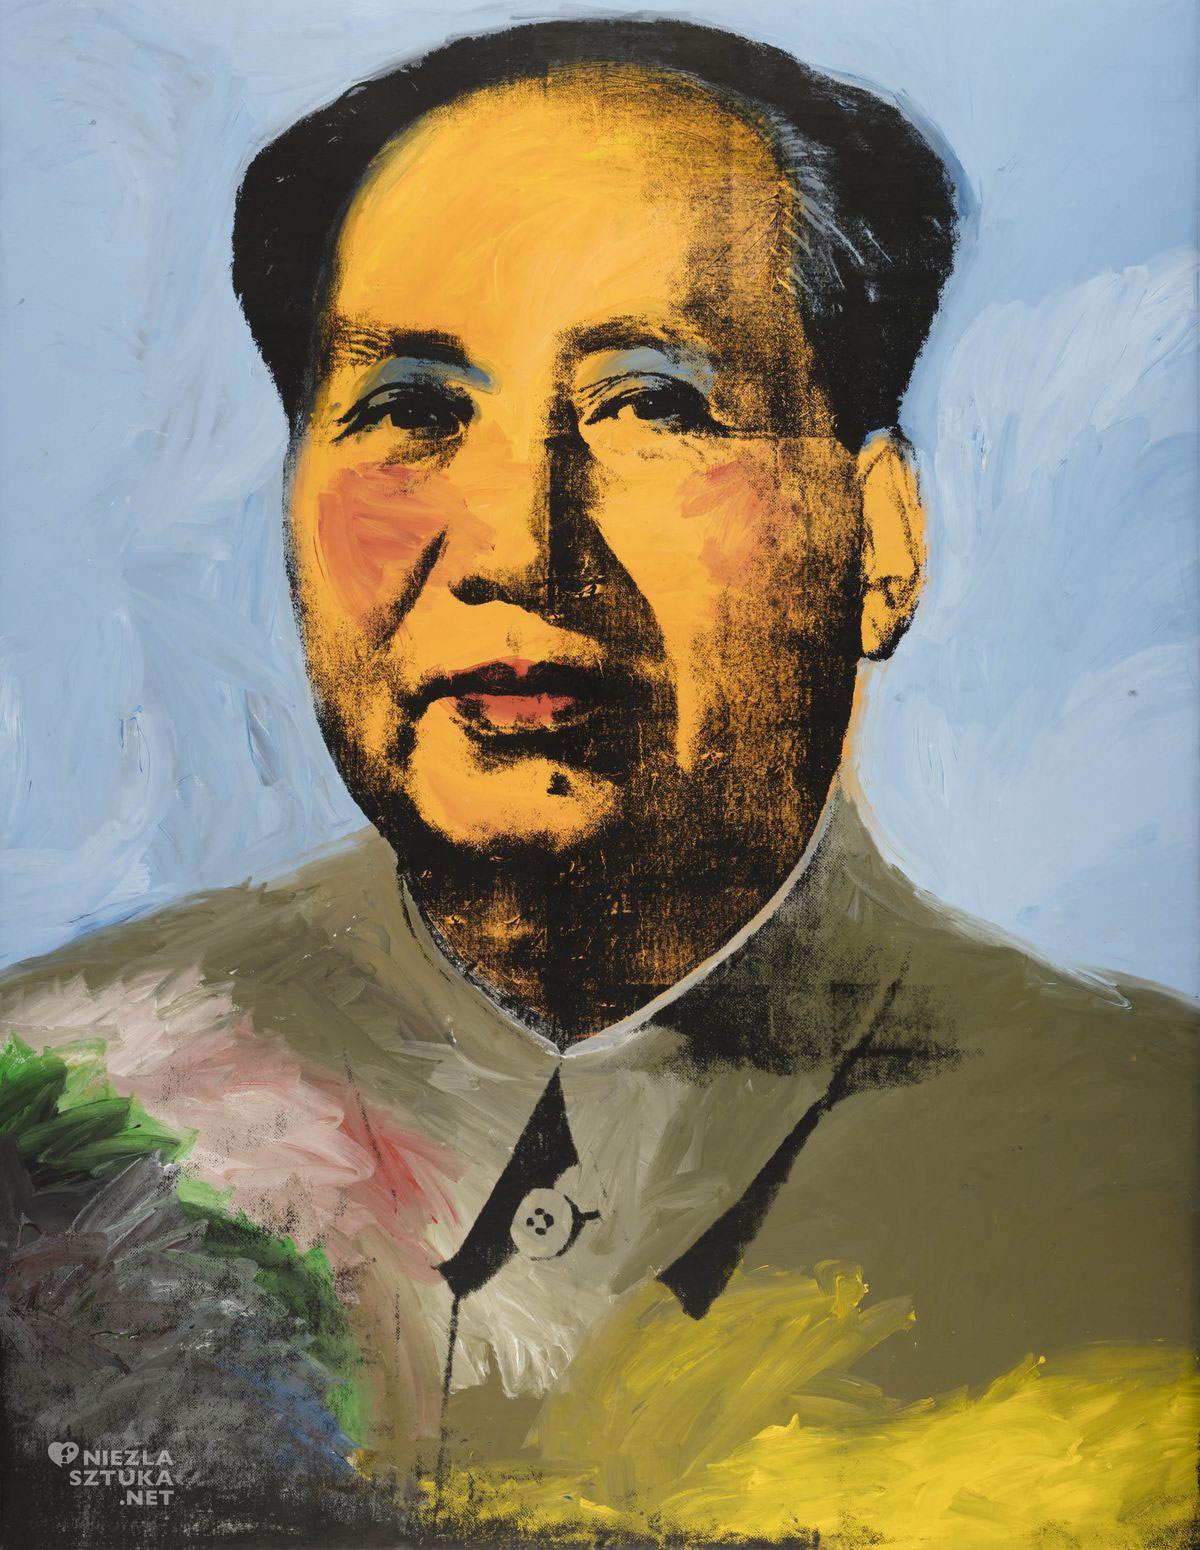 Andy Warhol, Mao, sitodruk, pop-art, Niezła Sztuka